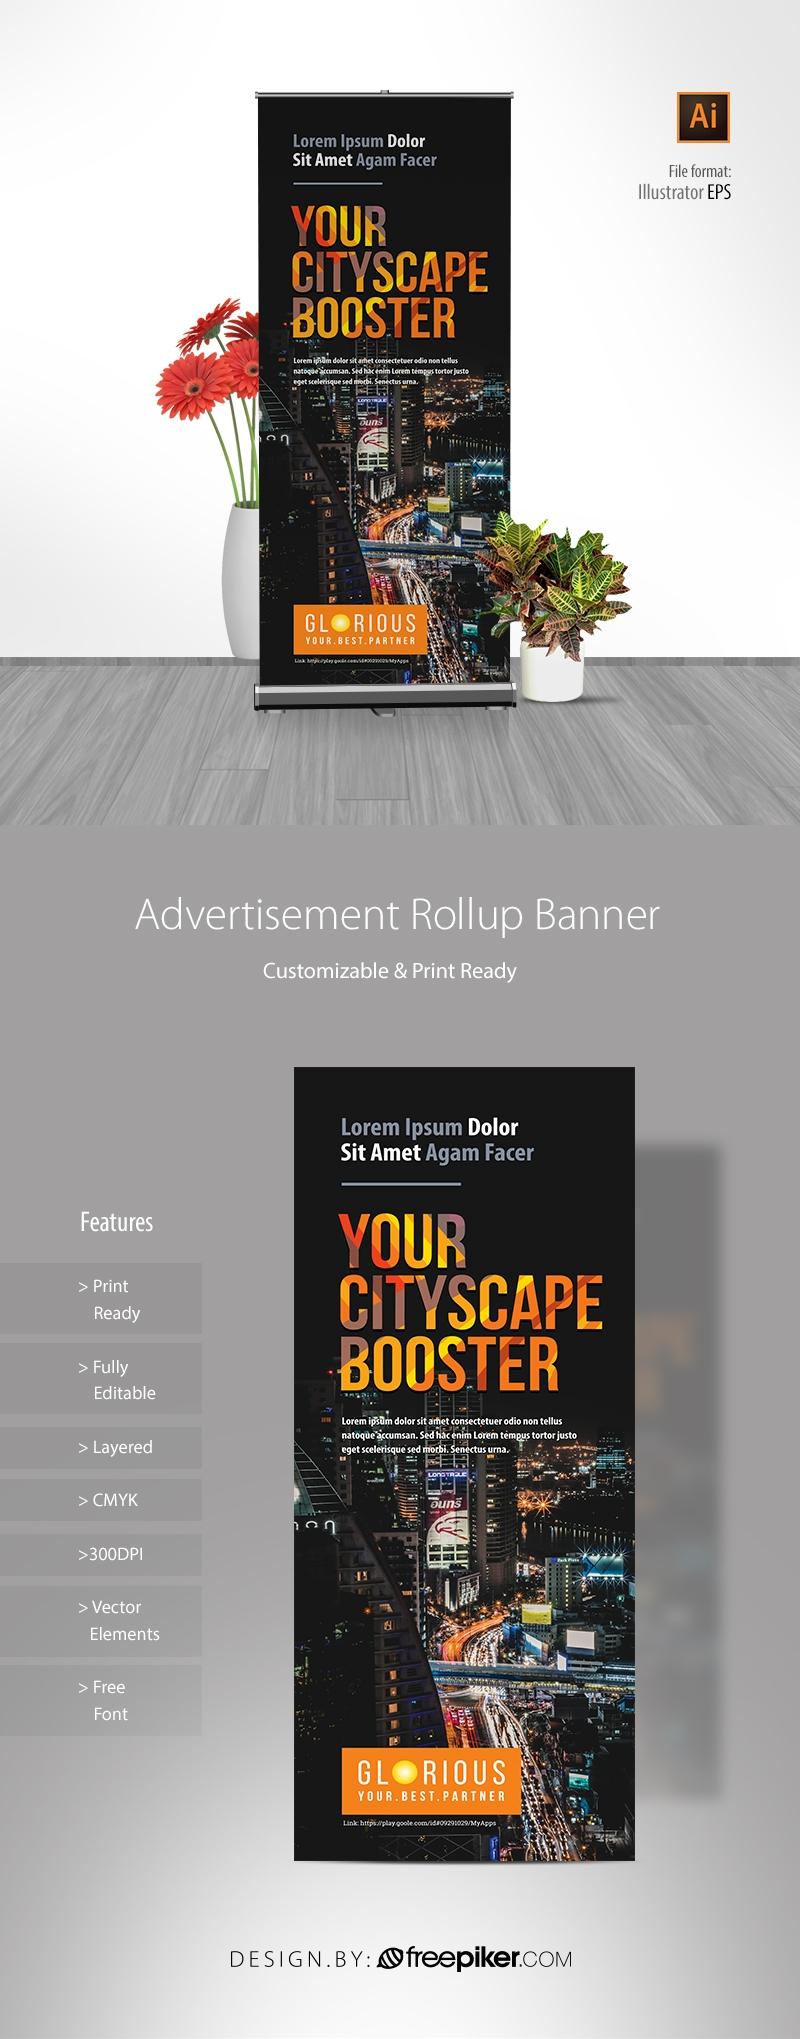 Advertisement Rollup Banner